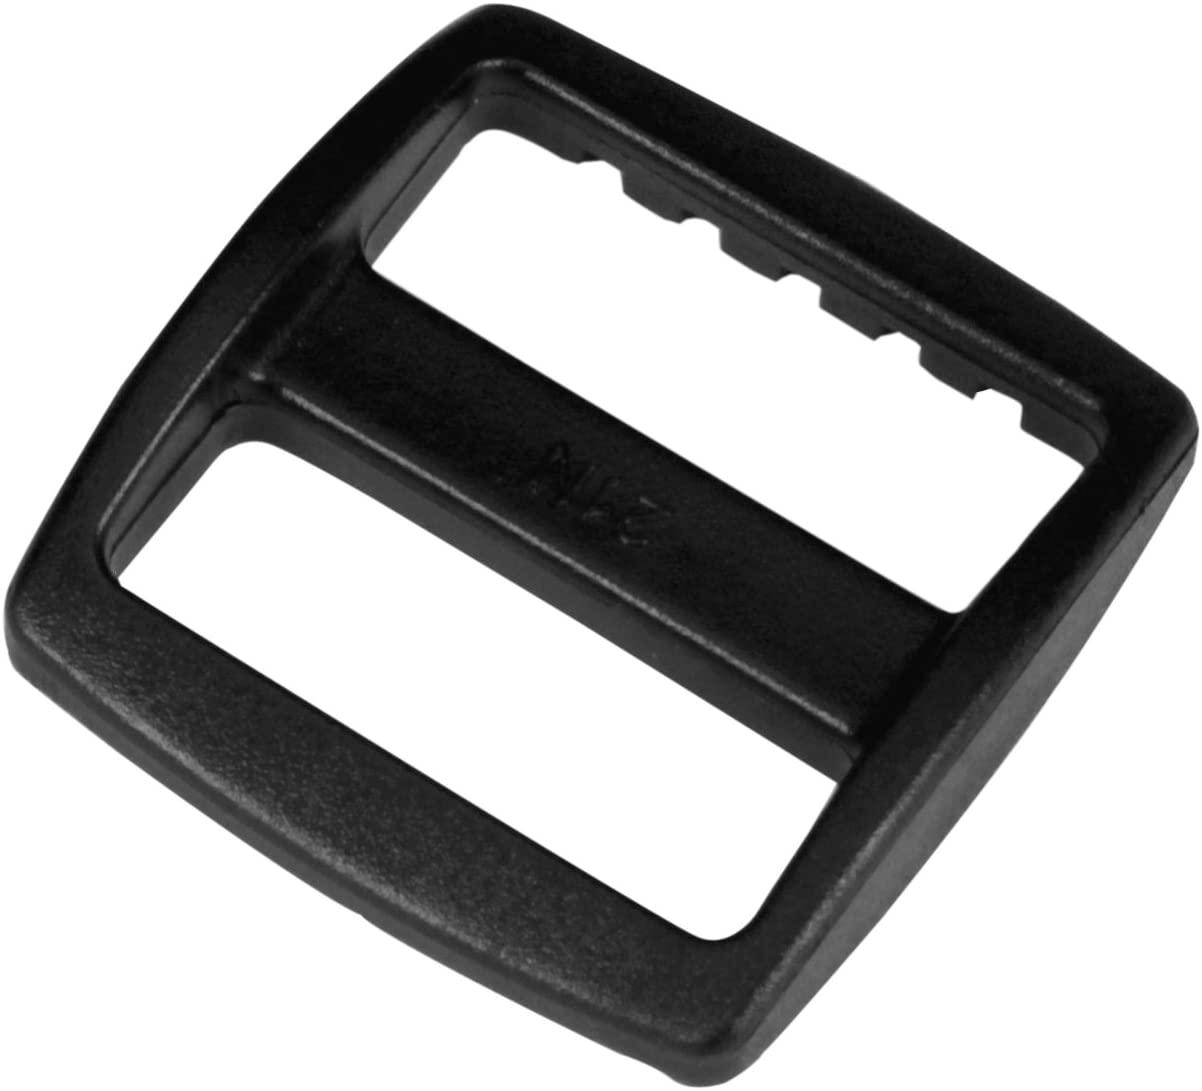 Strapworks Black Plastic Wide Mouth Tri-Glide Slide – for Bag Straps, Rifle Slings, Dog Collars - 1 Inch